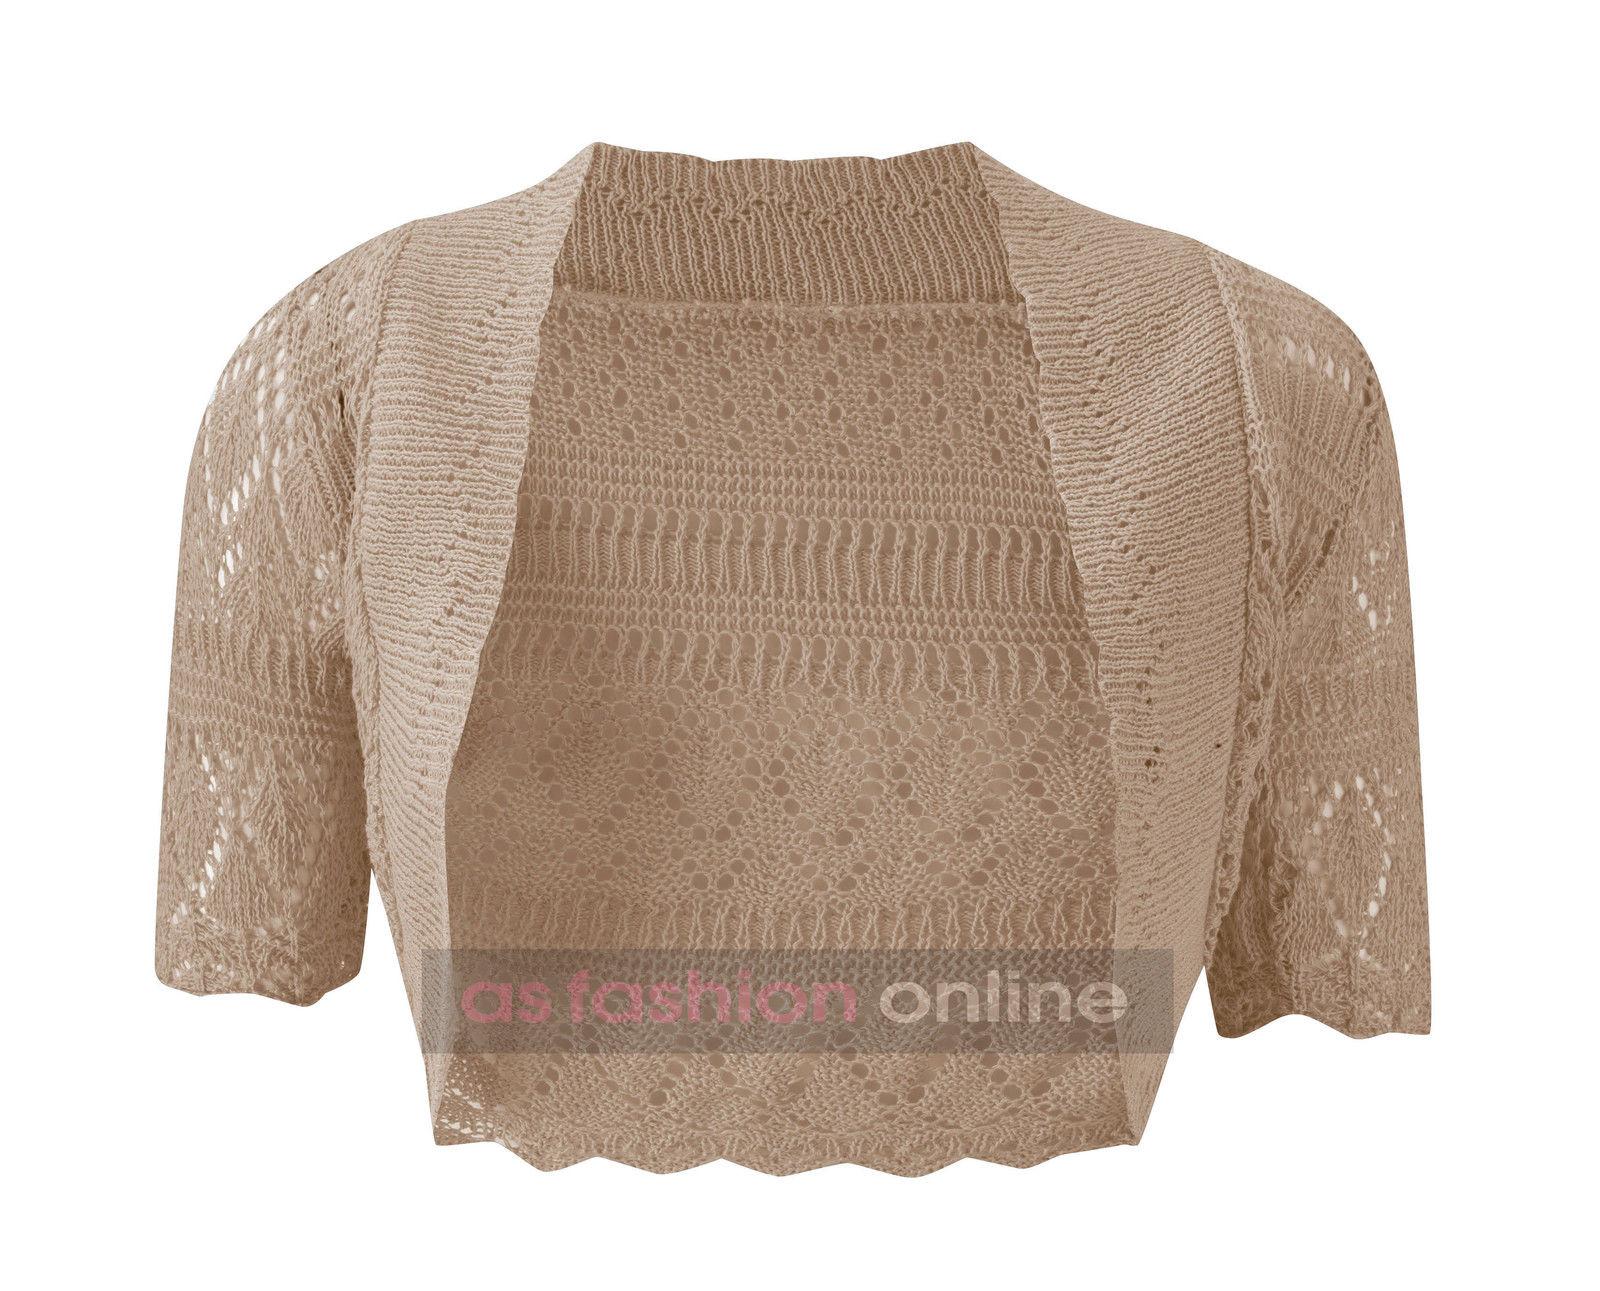 Crochet Shrug : Womens-Crochet-Shrug-Ladies-Knitted-Bolero-Cardigan-Cover-Up-Top-Sizes ...